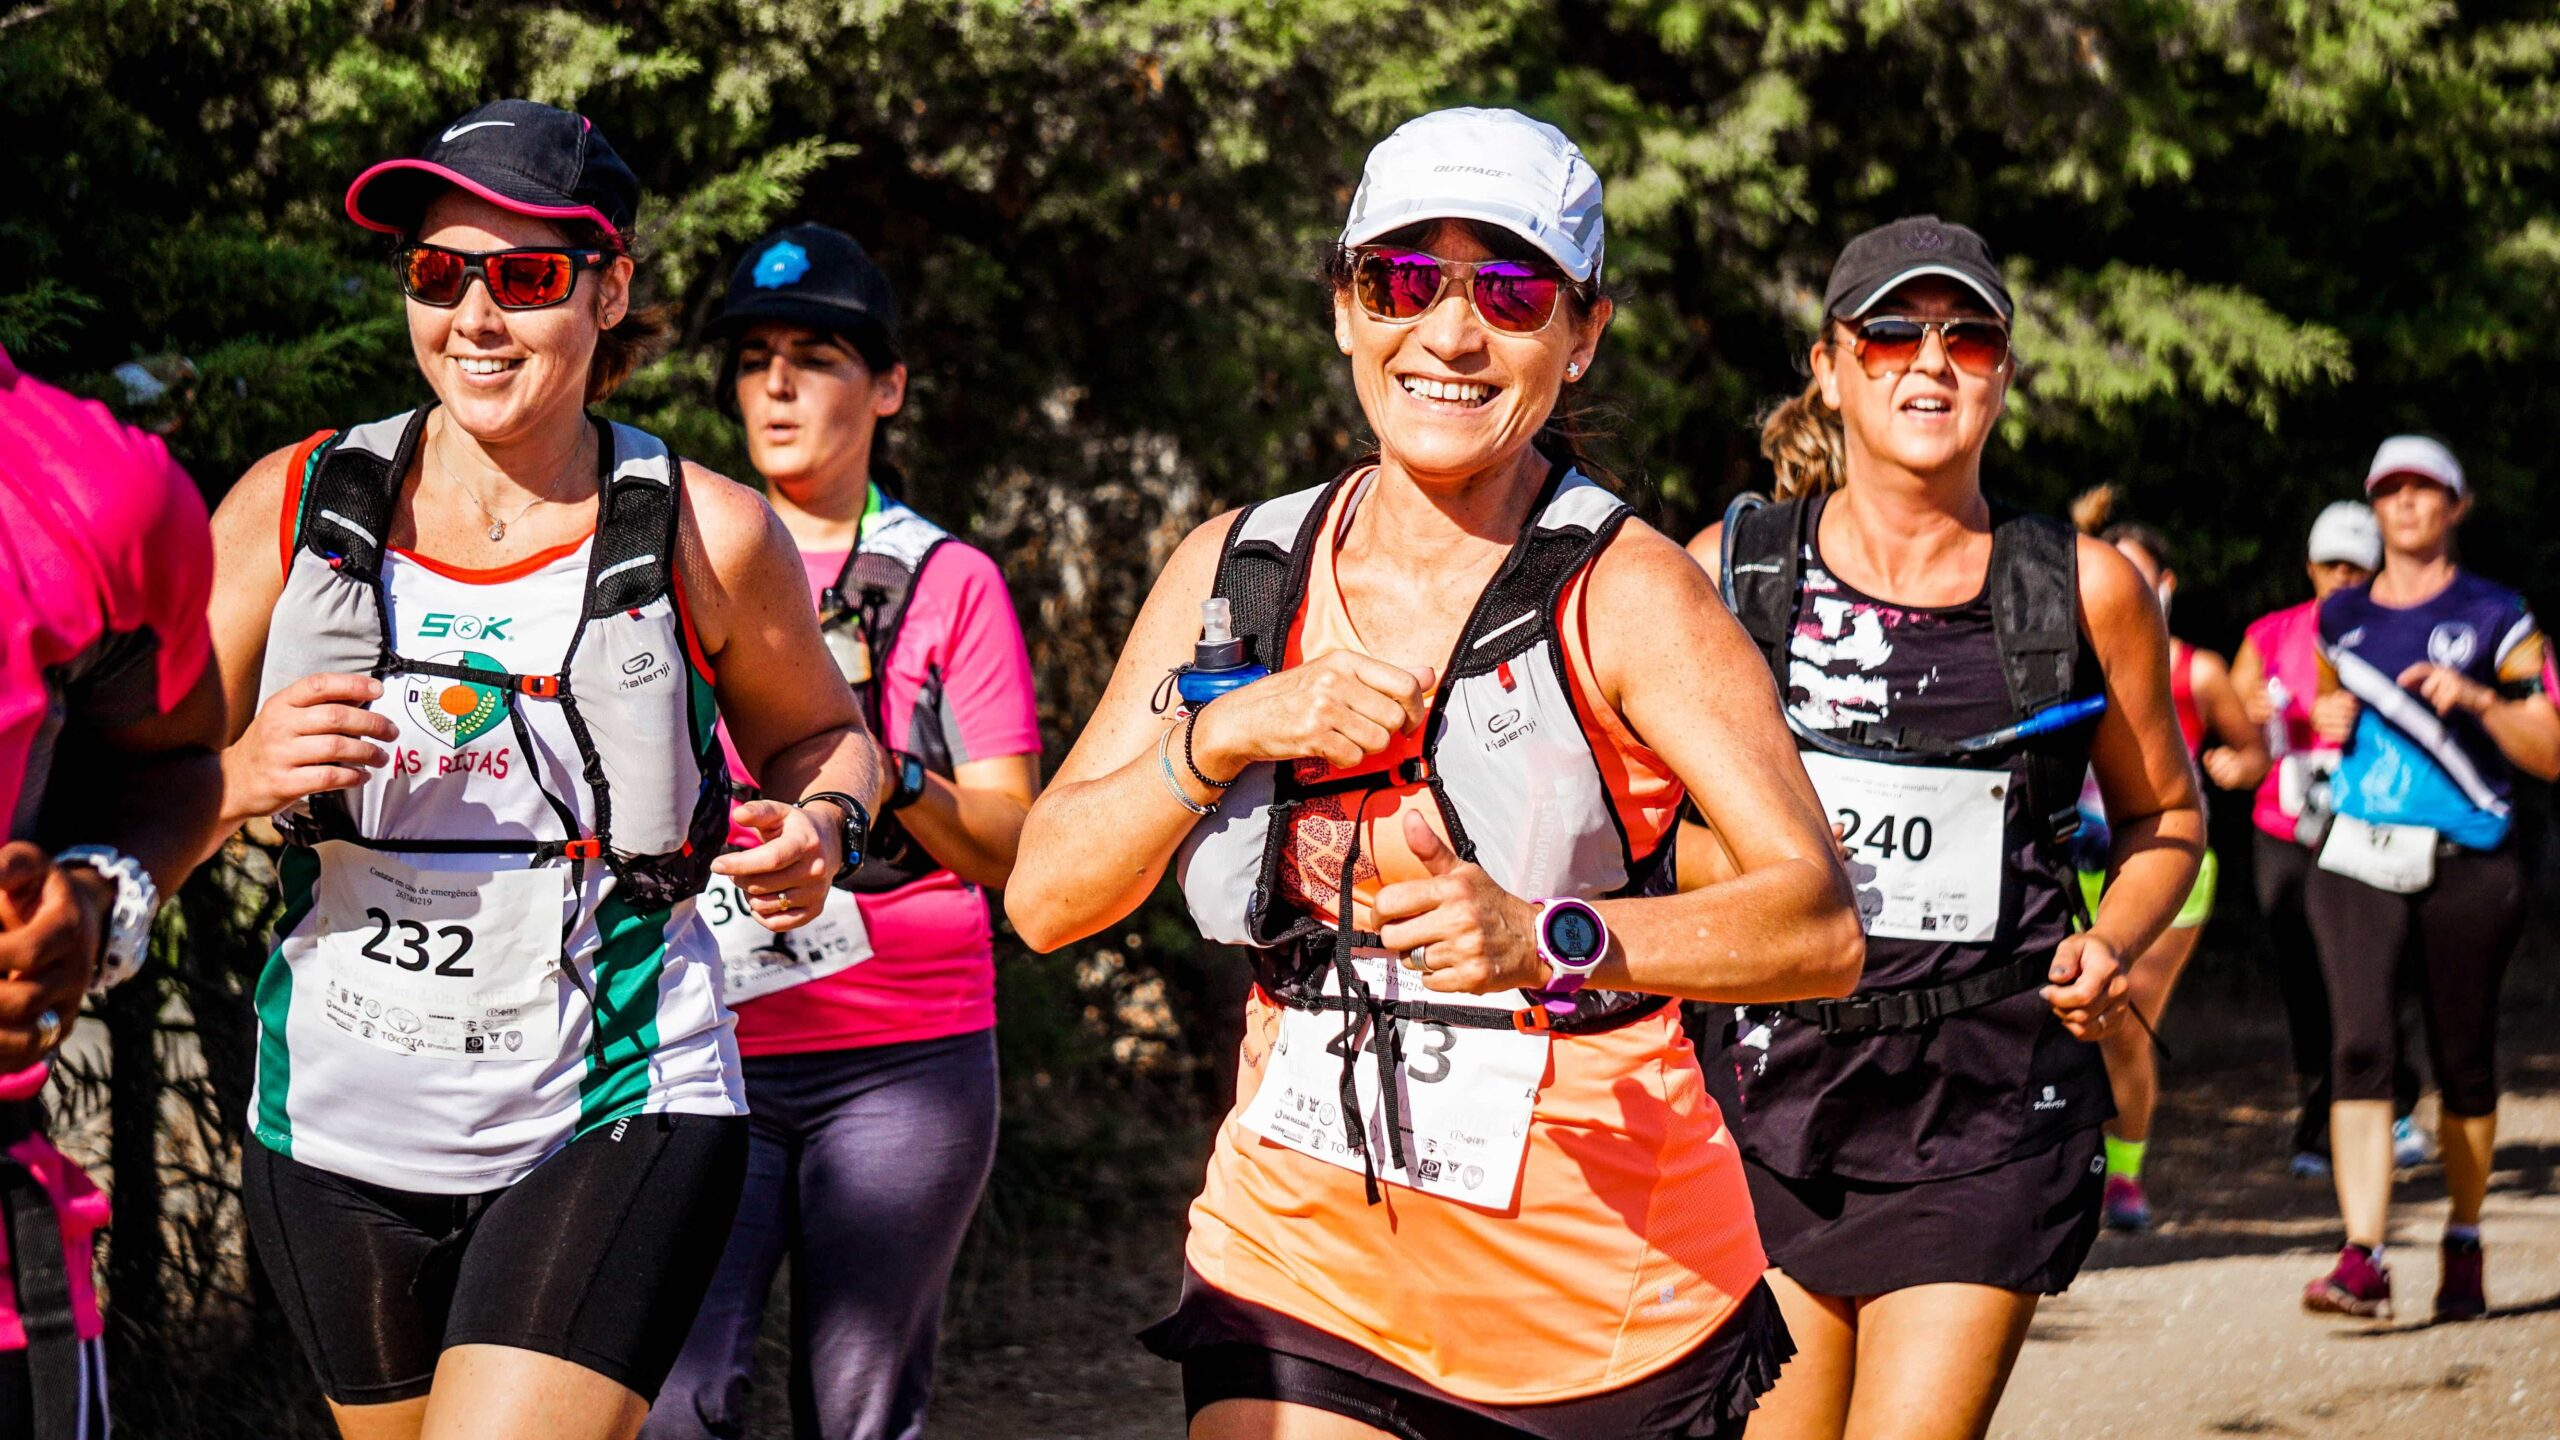 group-of-people-doing-marathon-1571939-min